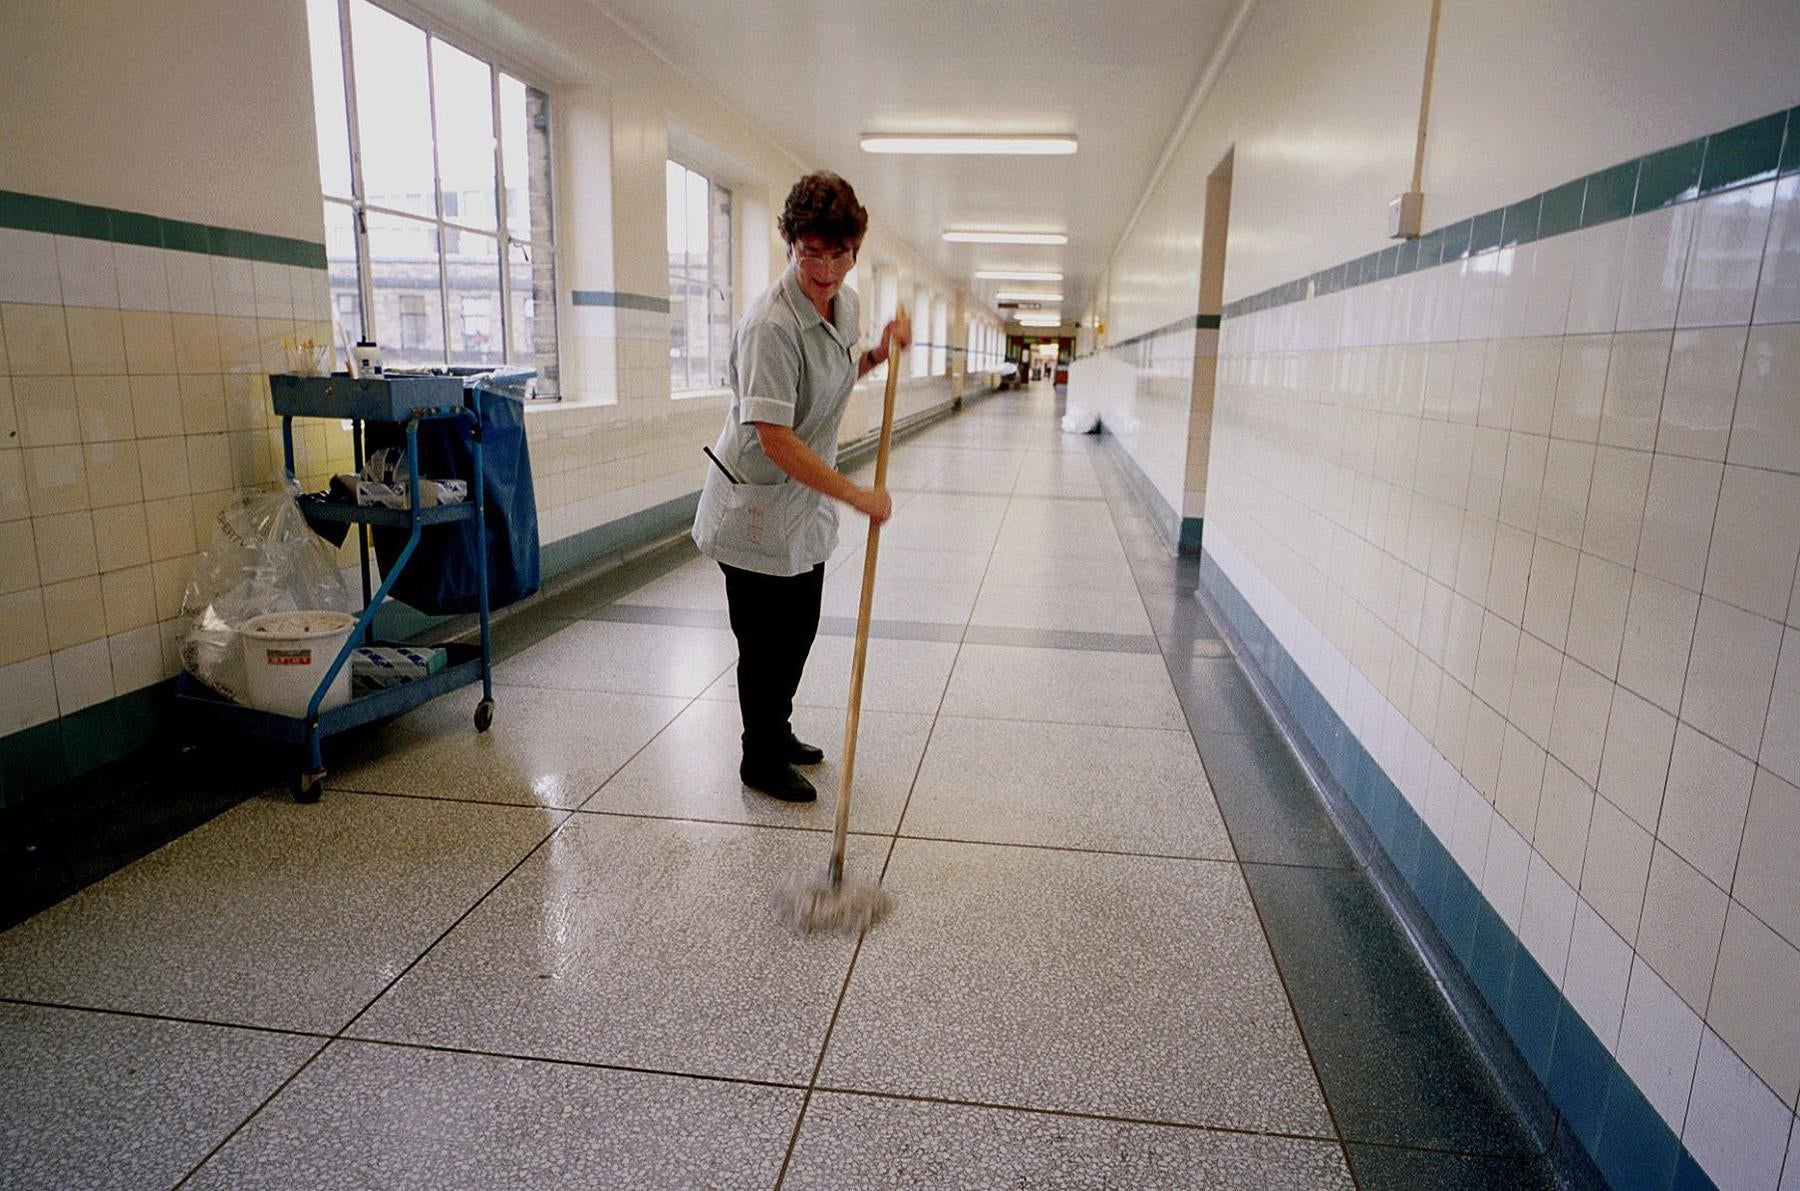 nhs hospital cleaner.'